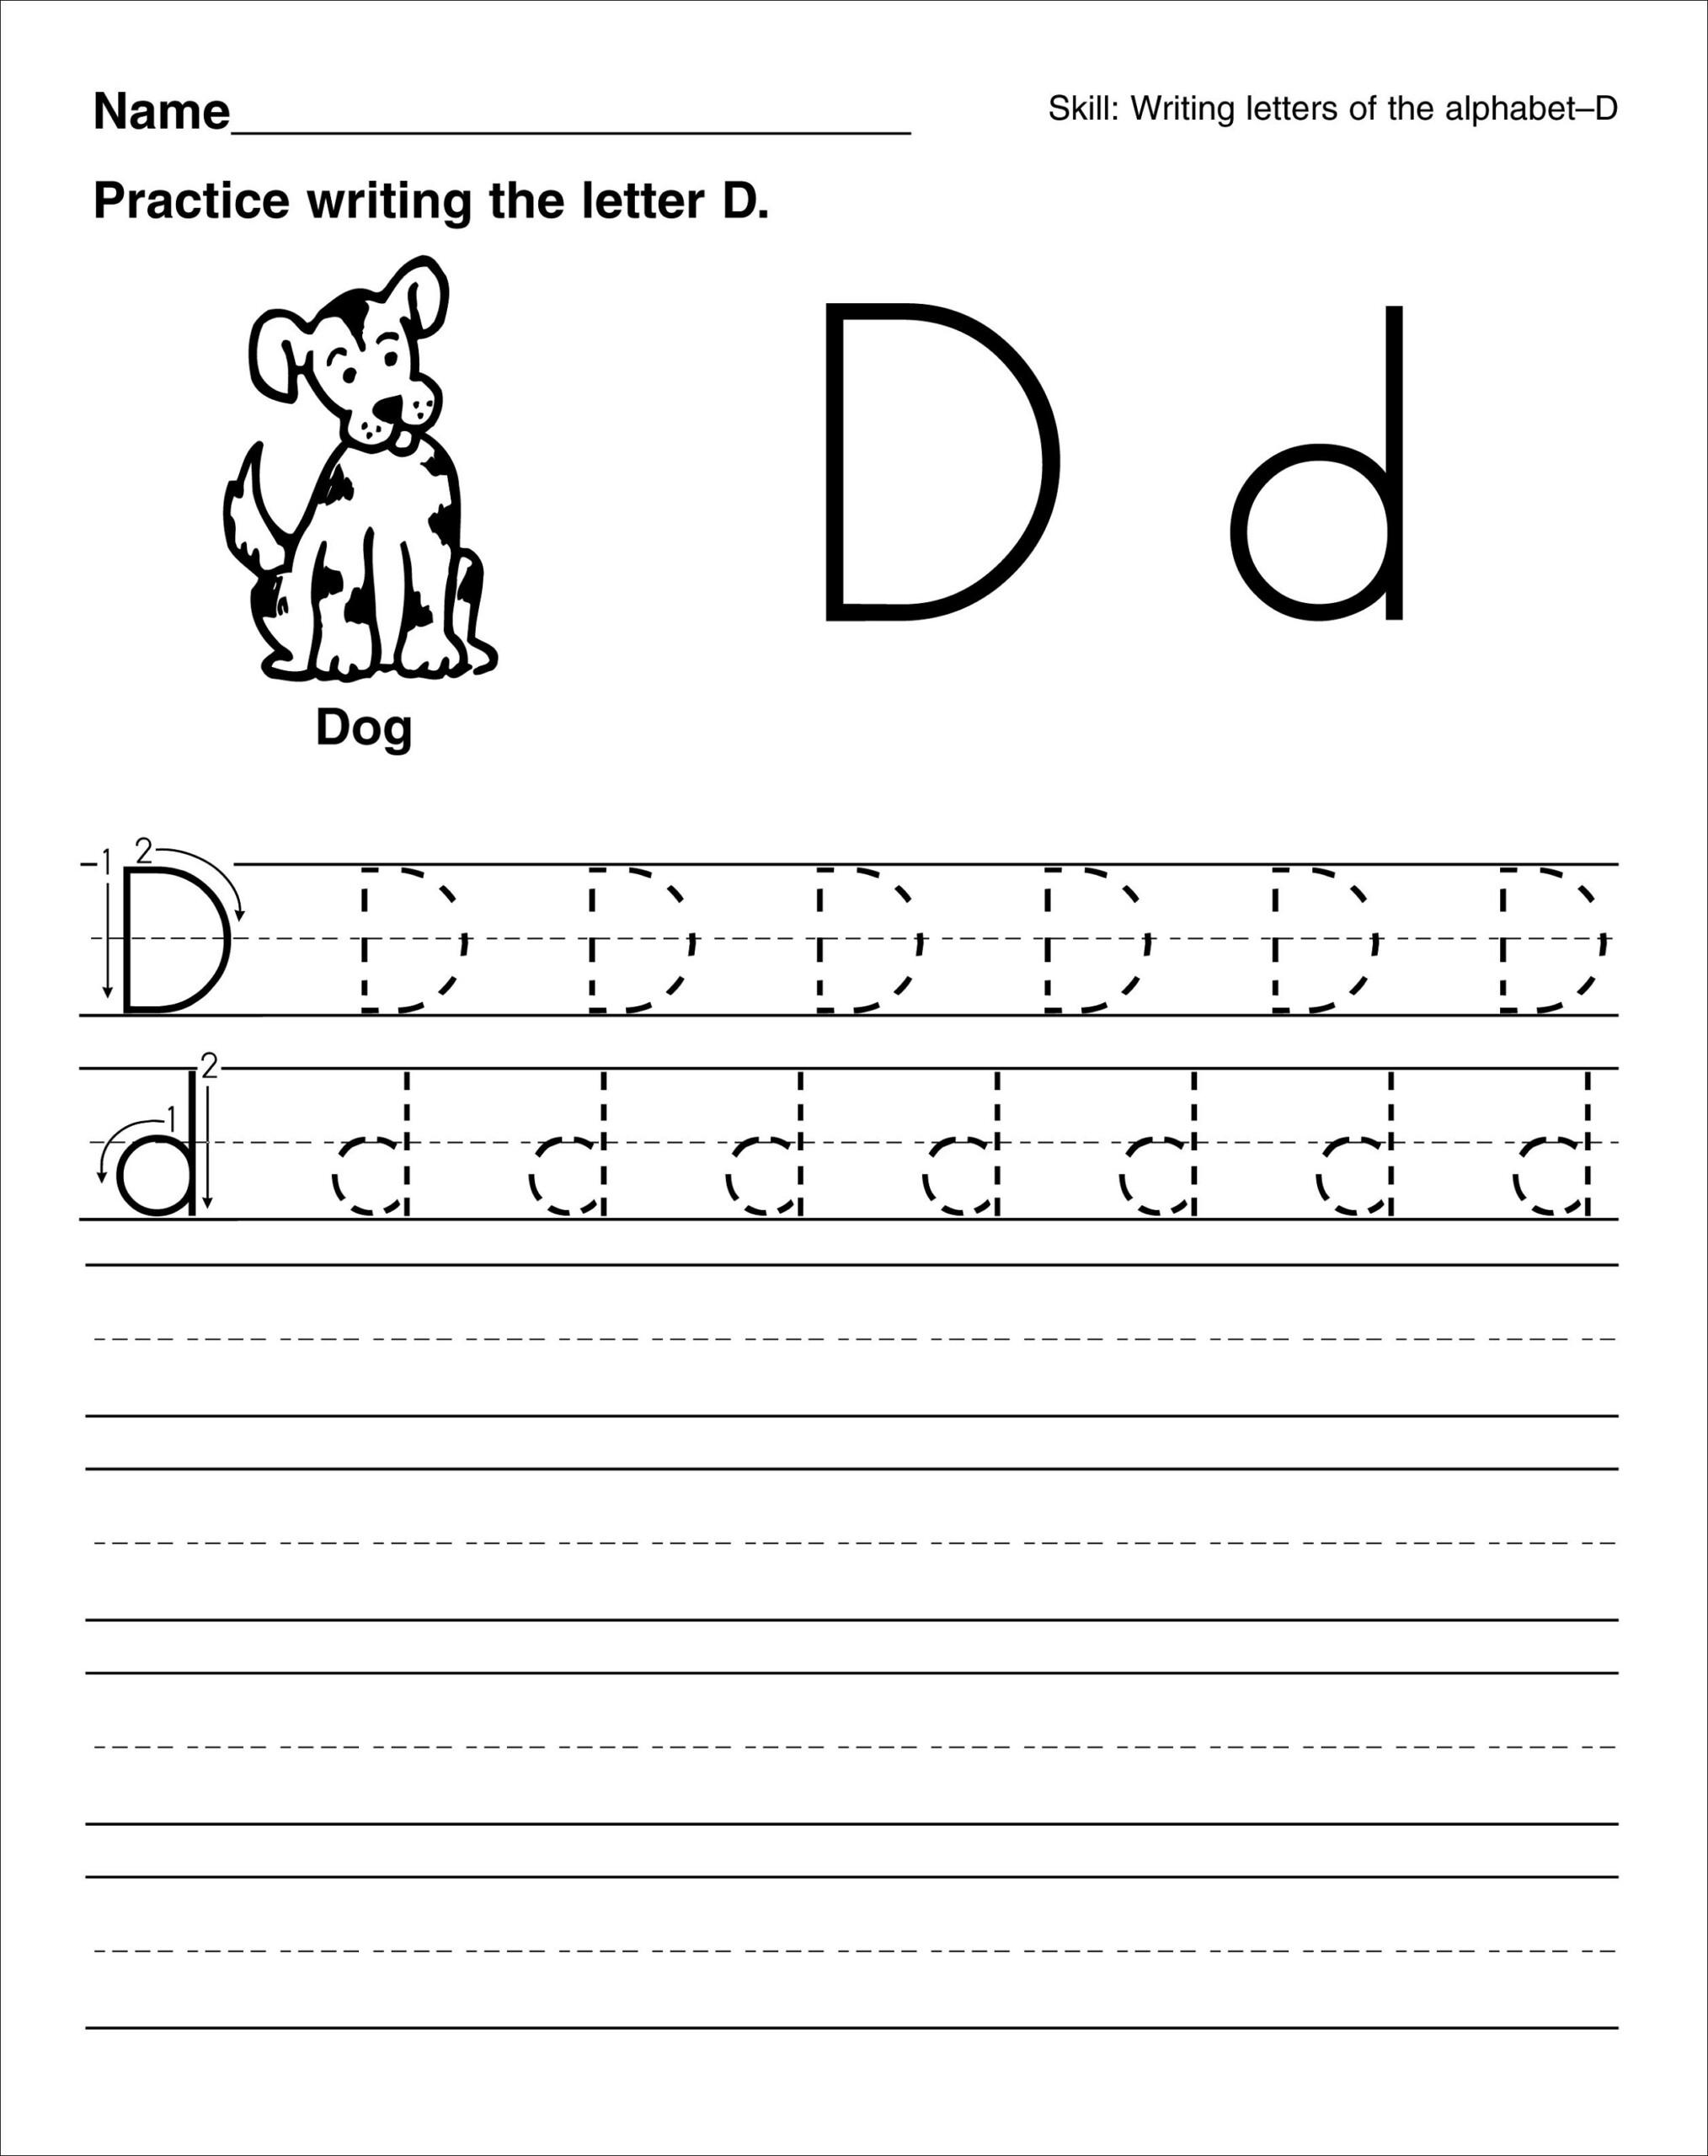 Forming Letters Worksheets | Printable Worksheets And within Letter E Worksheets Sparklebox